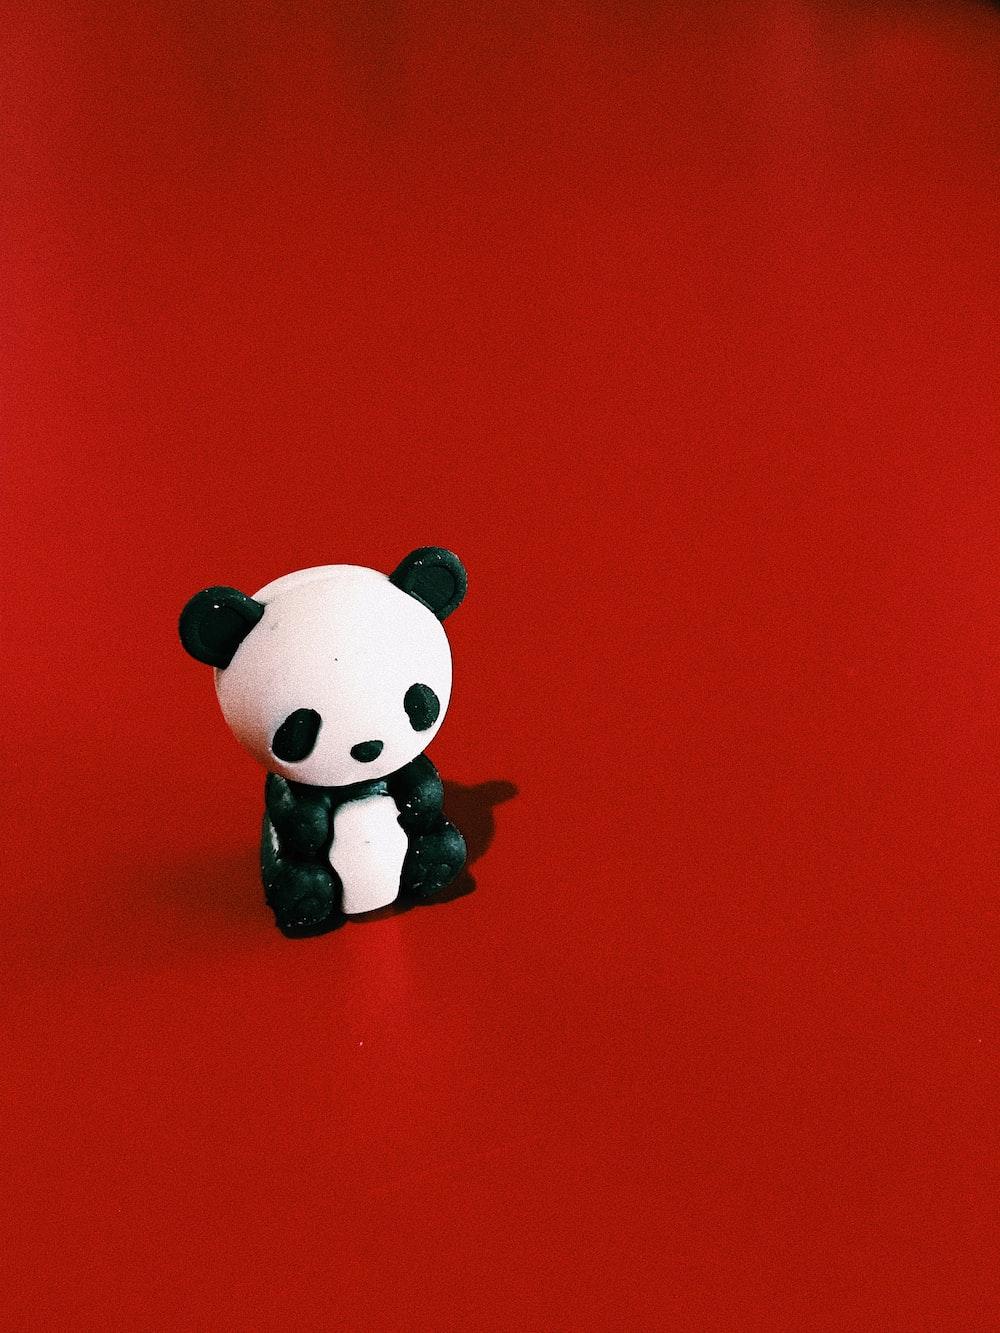 panda bear figurine sitting on red surface